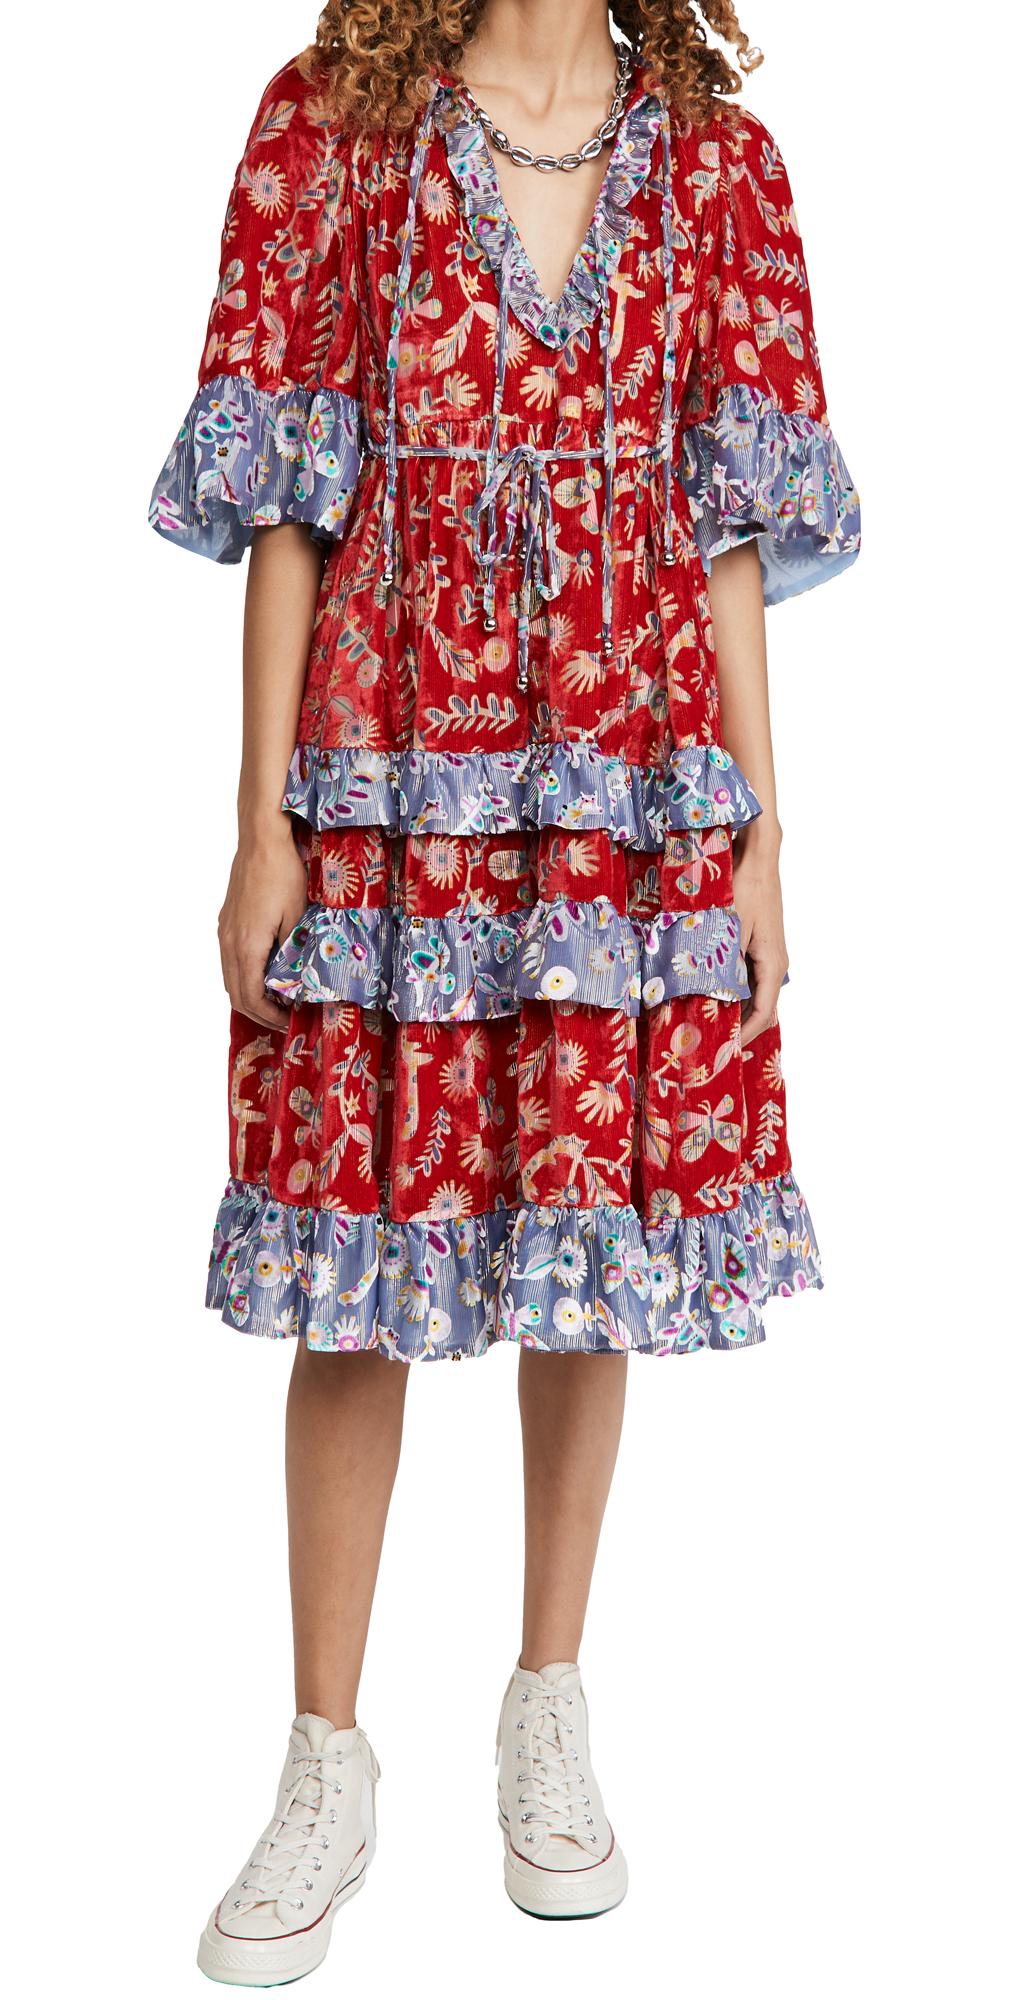 CeliaB Matilda Dress